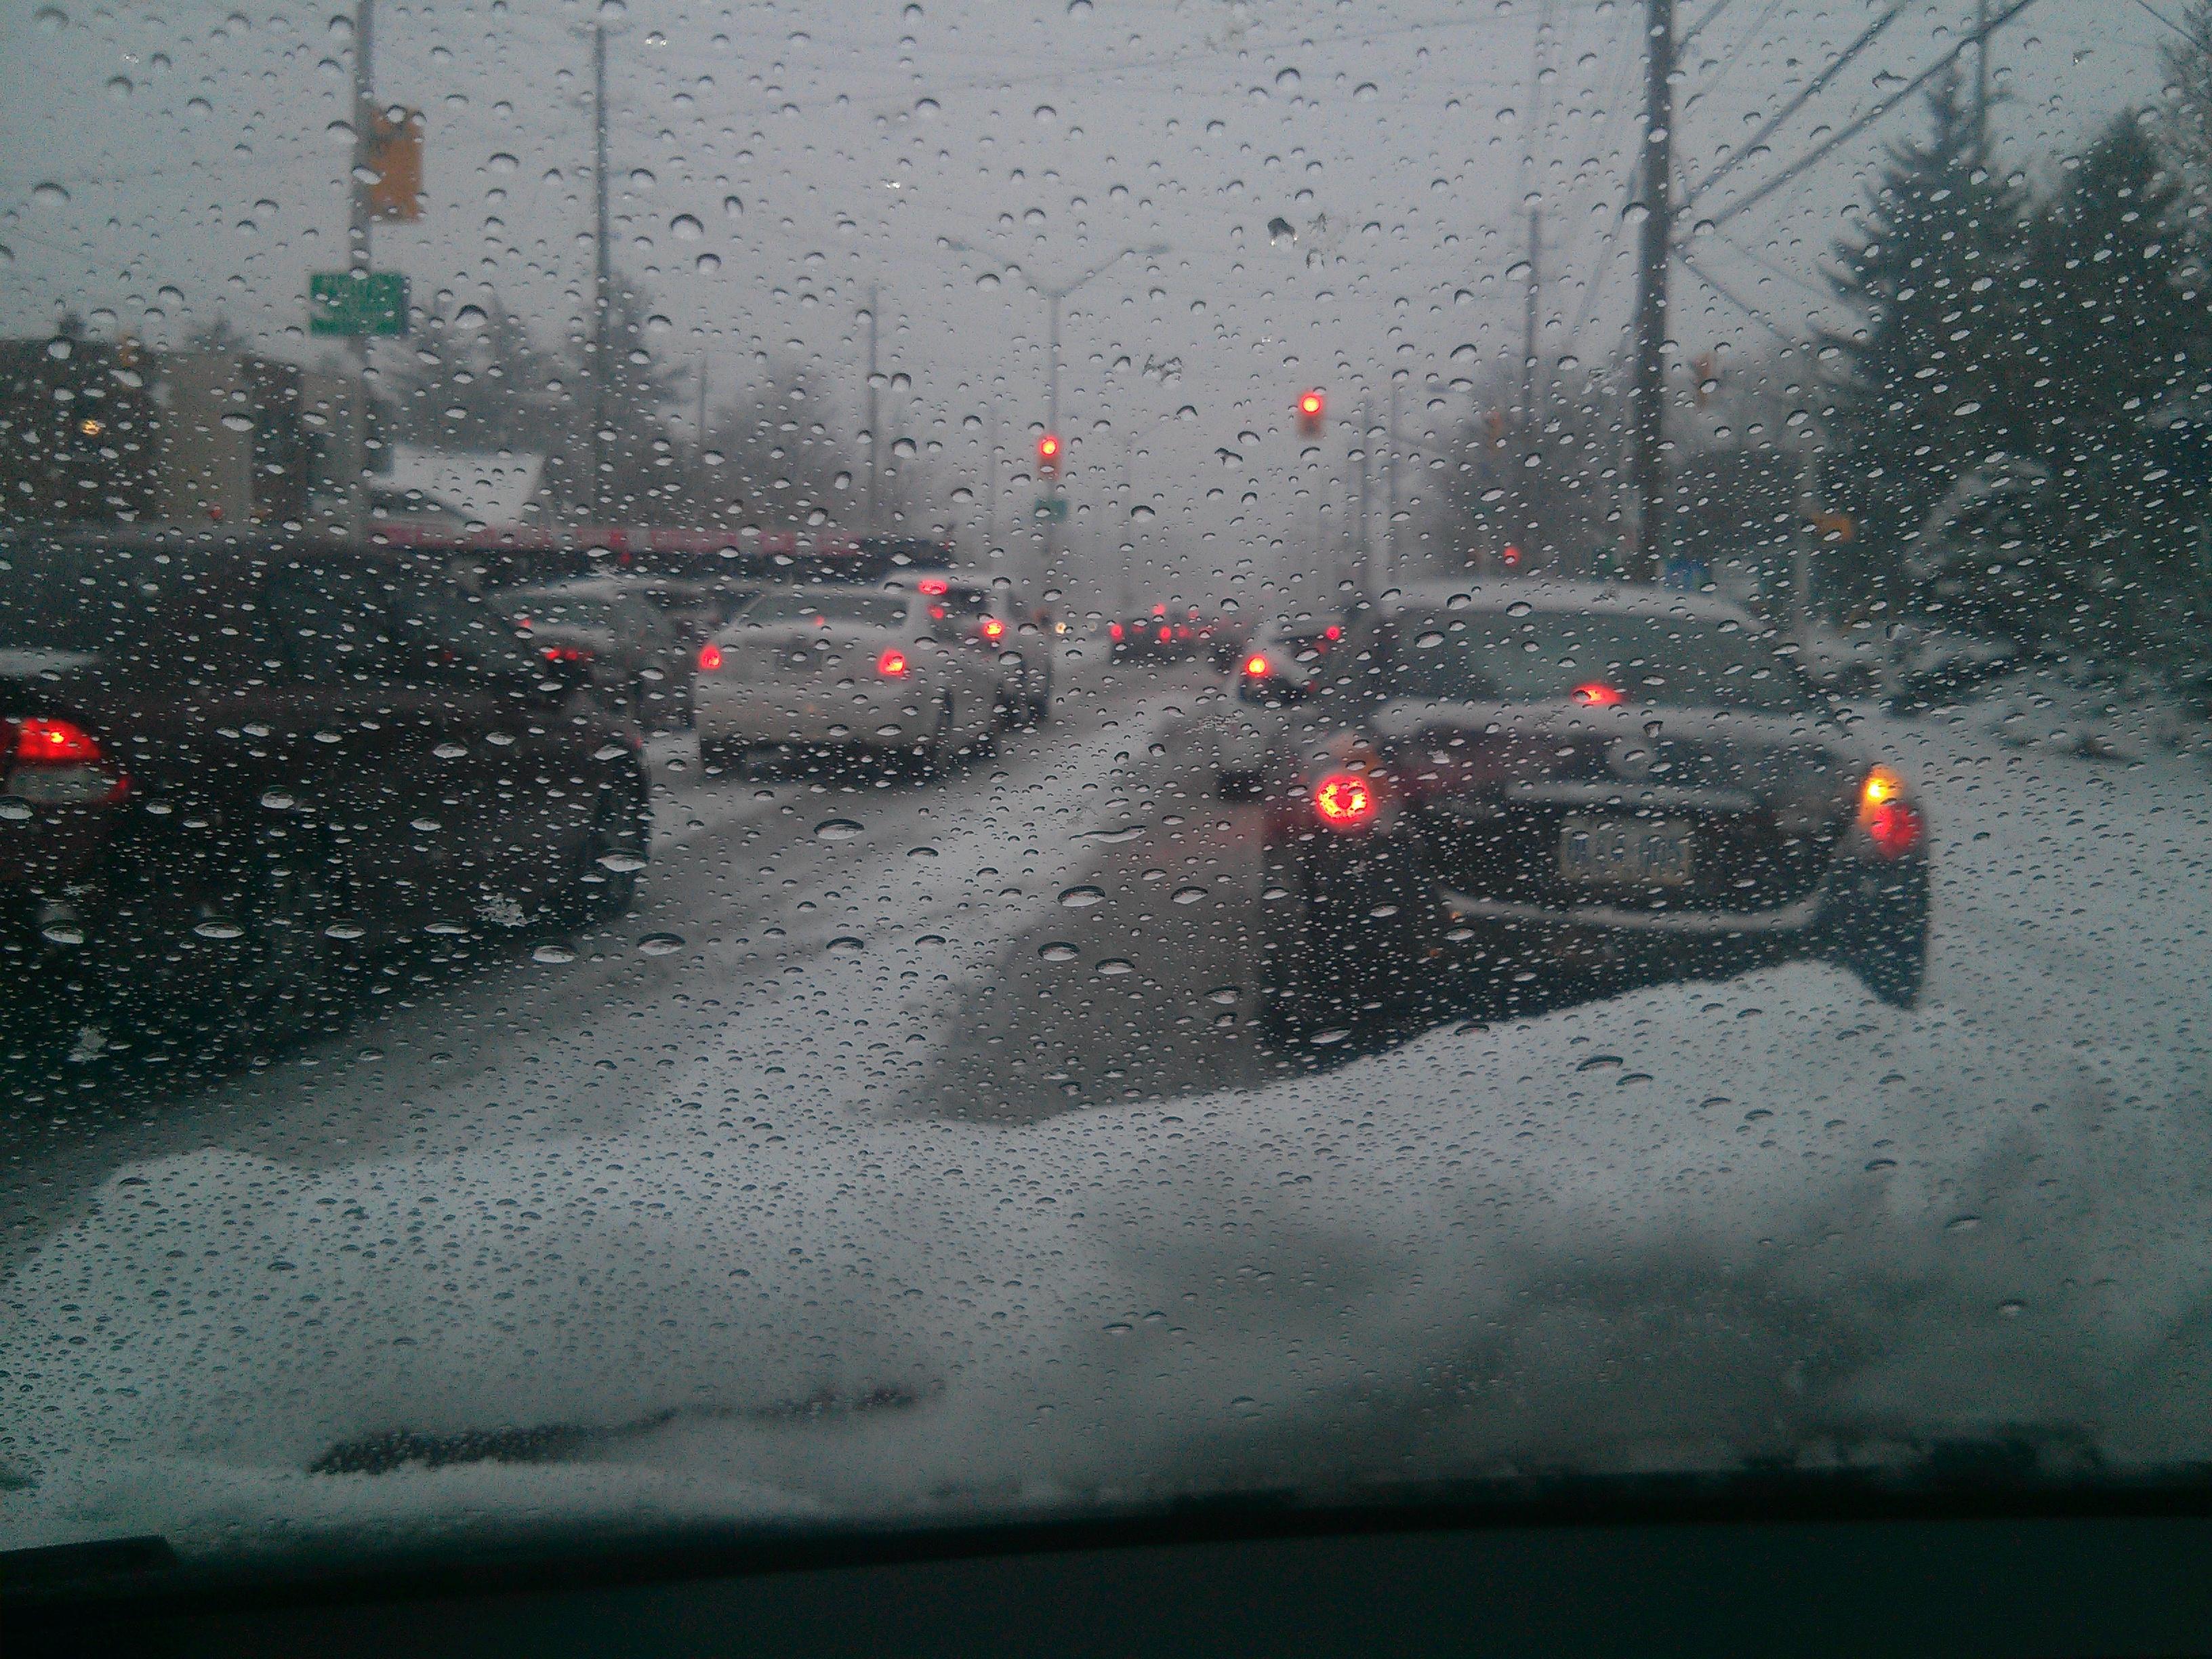 Not fun driving